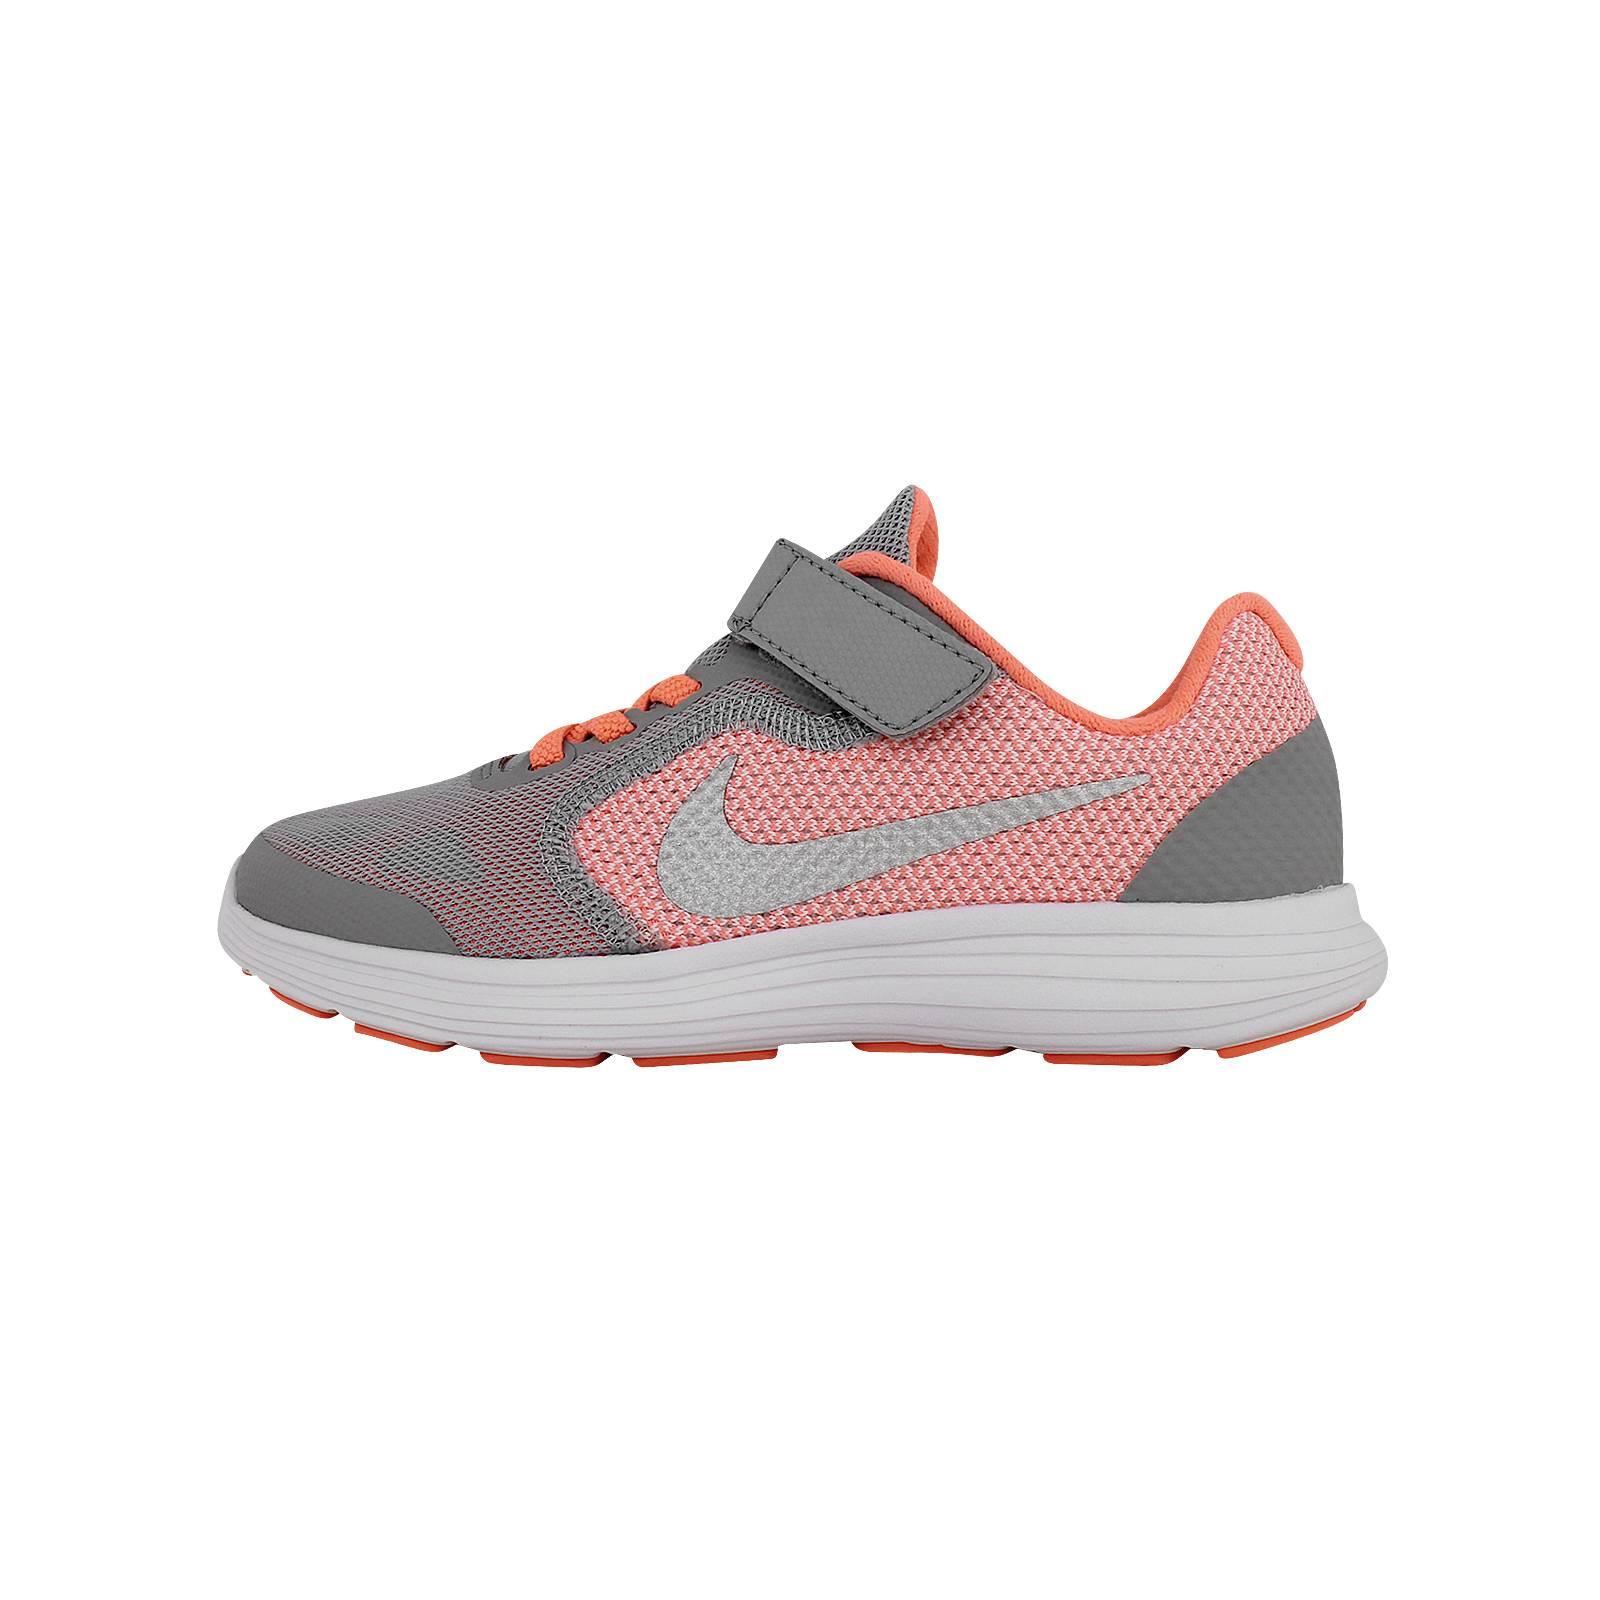 6e02602fecc Αθλητικά Παιδικά Παπούτσια Nike Nike Revolution 3 PSV